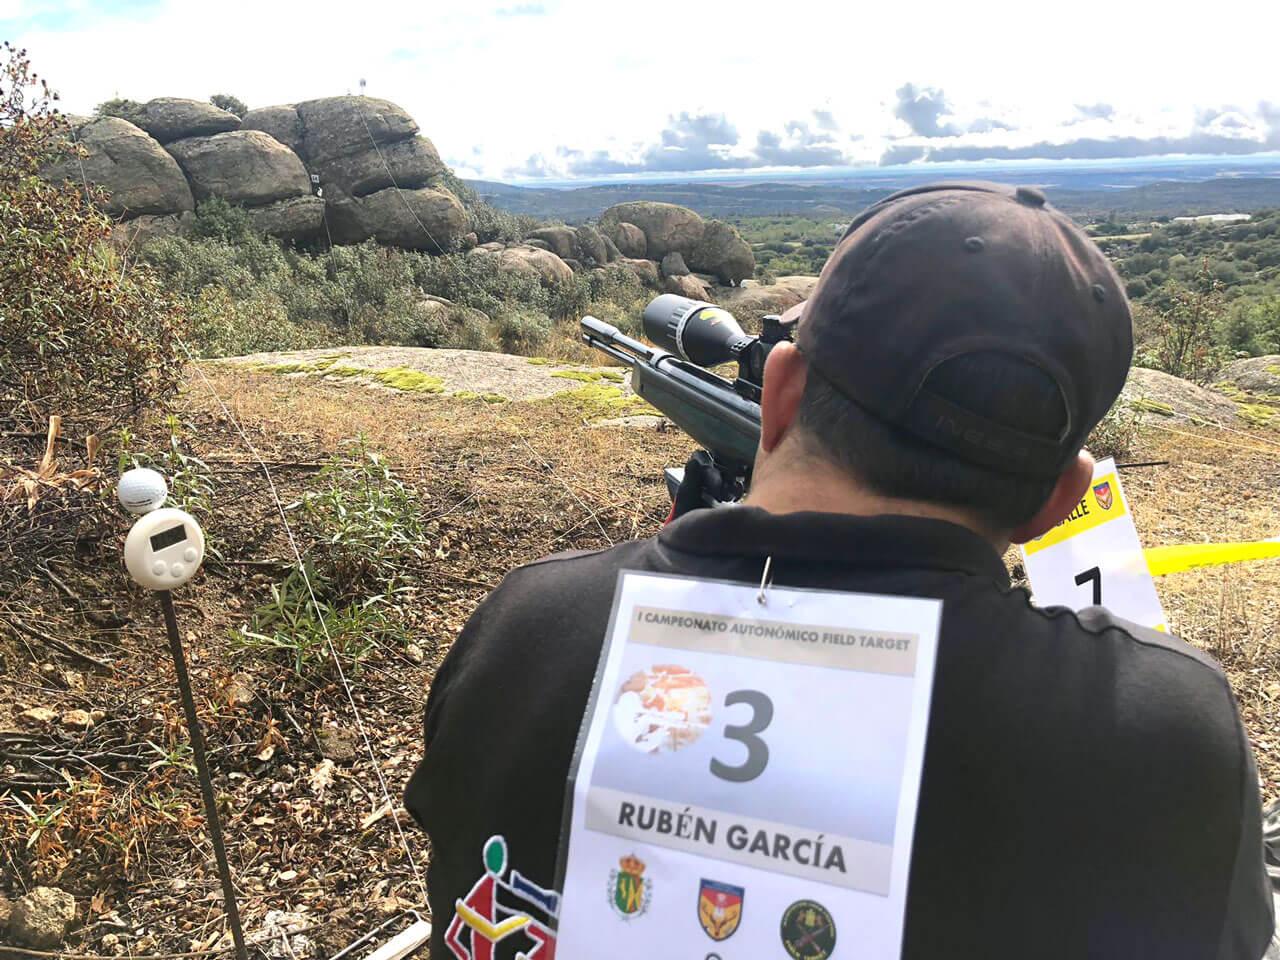 Campeonato Autonomico Field Target 2019